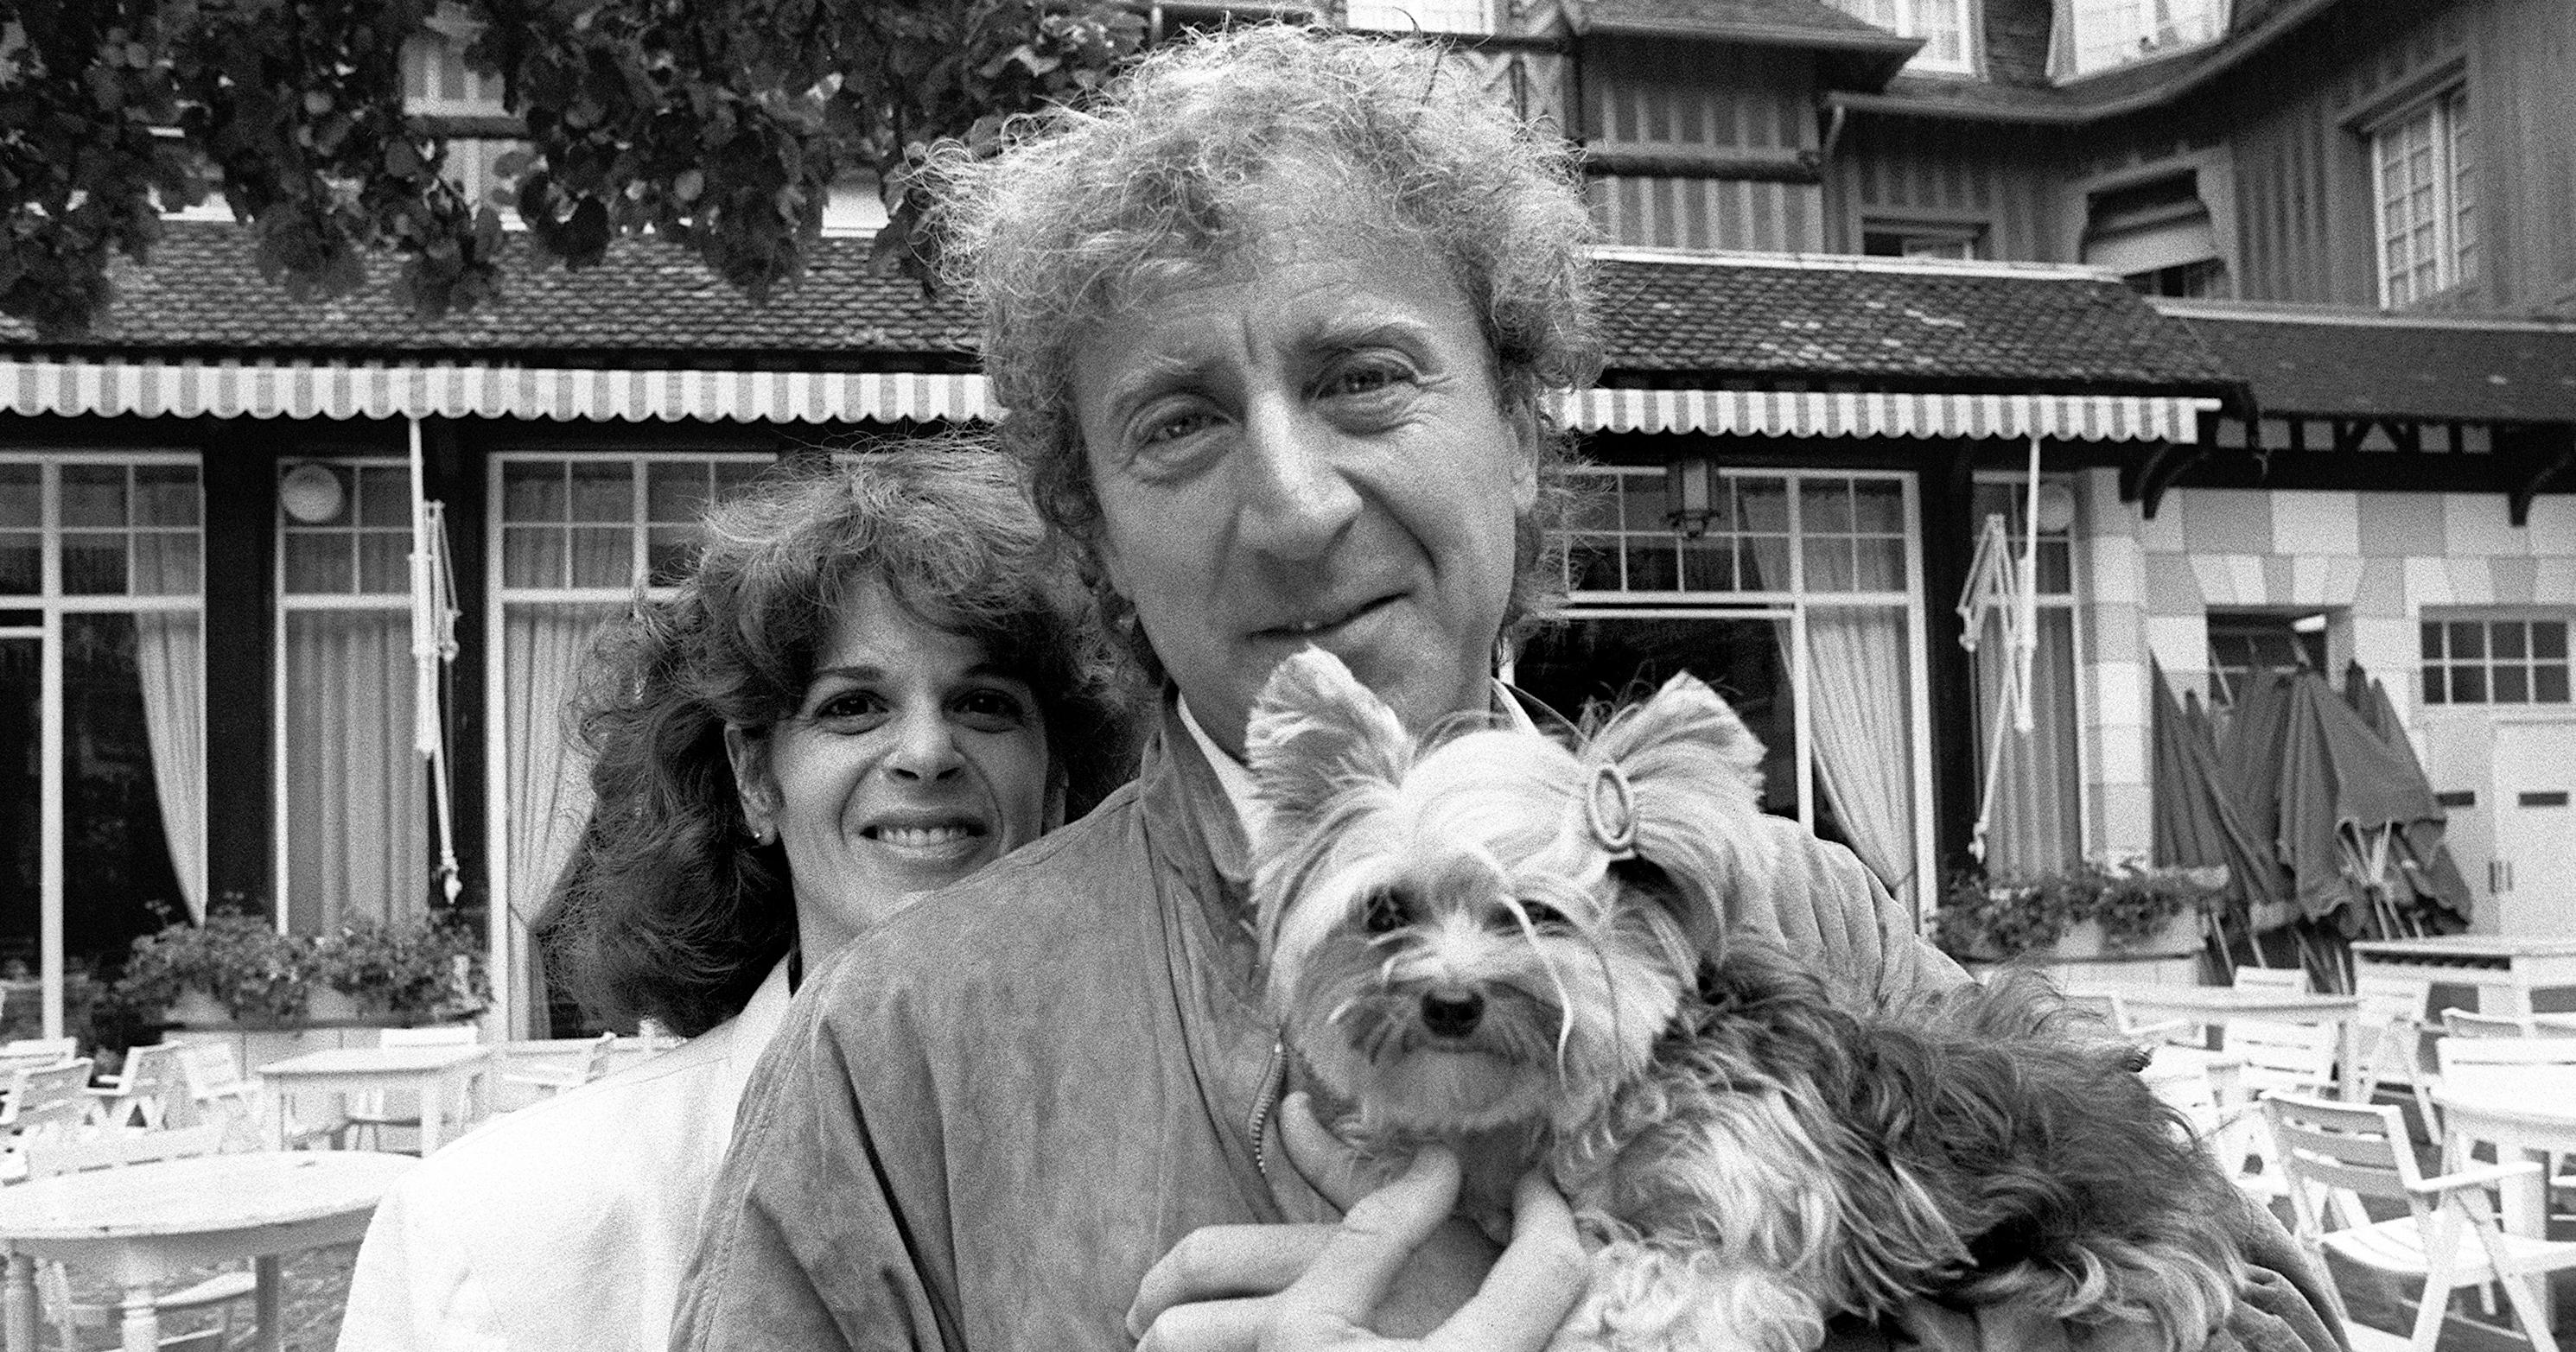 Gene Wilder and Gilda Radner, on Sept. 7, 1984 in Deauville, France.